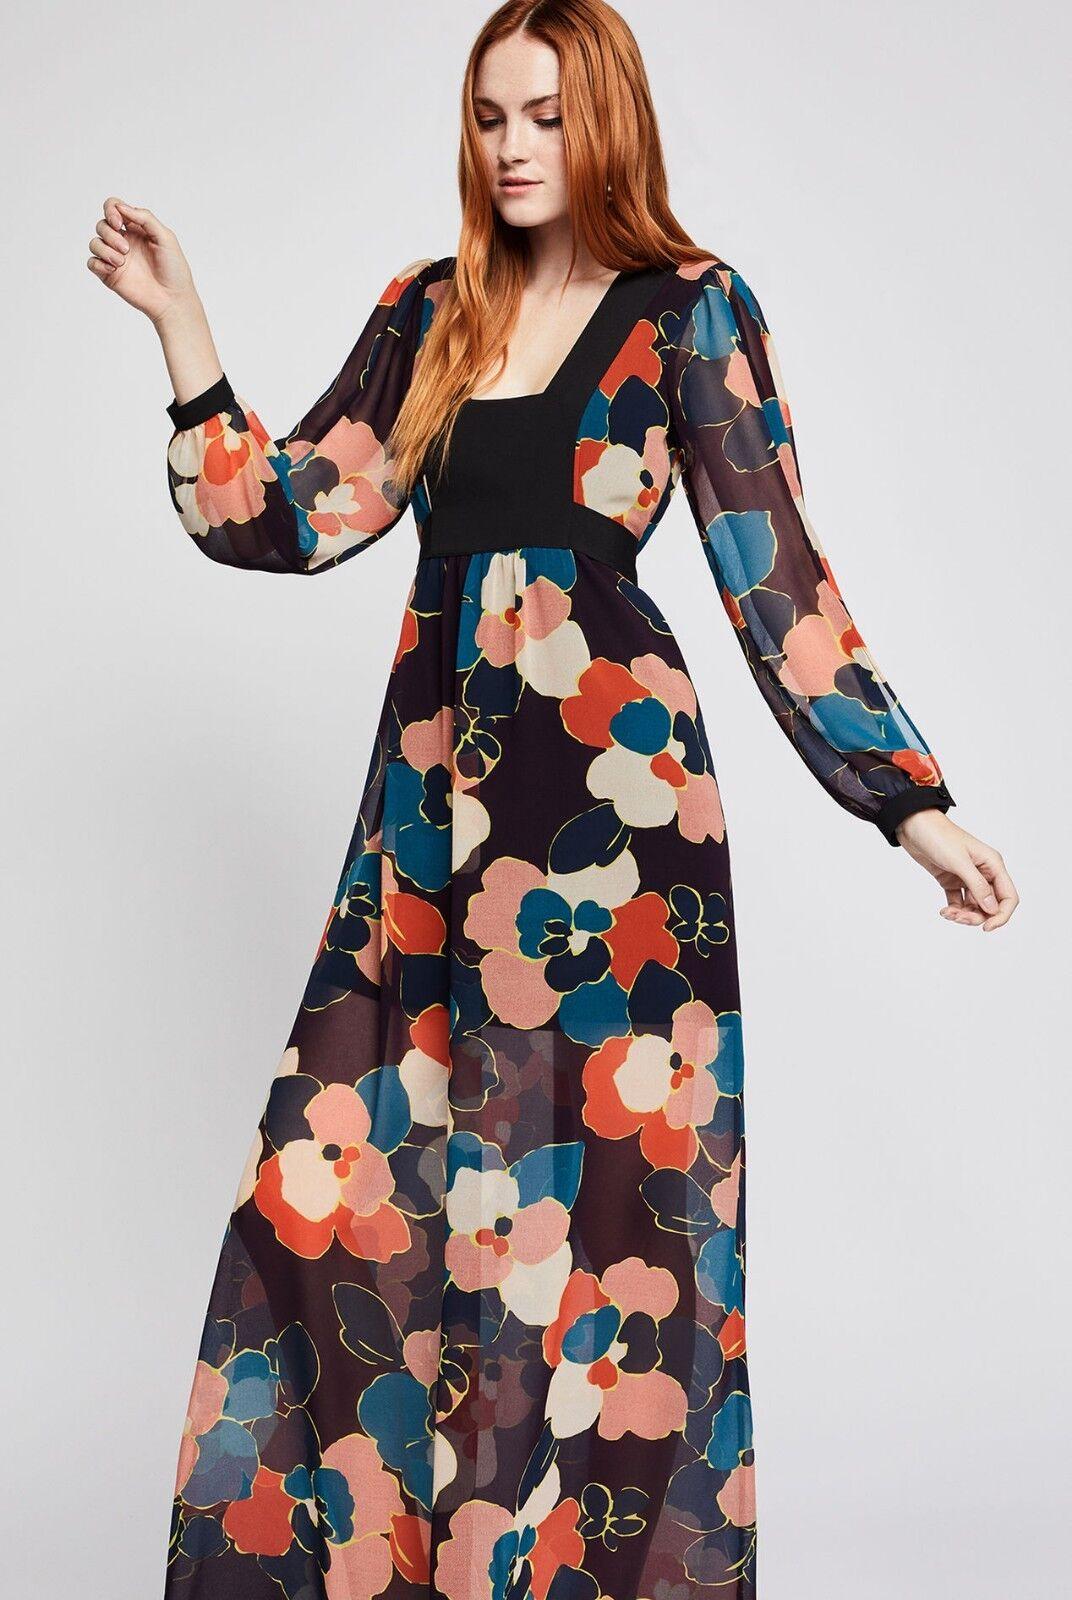 NWT BCBG Generation Graphic Multi Multi Multi color Floral Maxi Dress XS Retail  128.00 4133a7